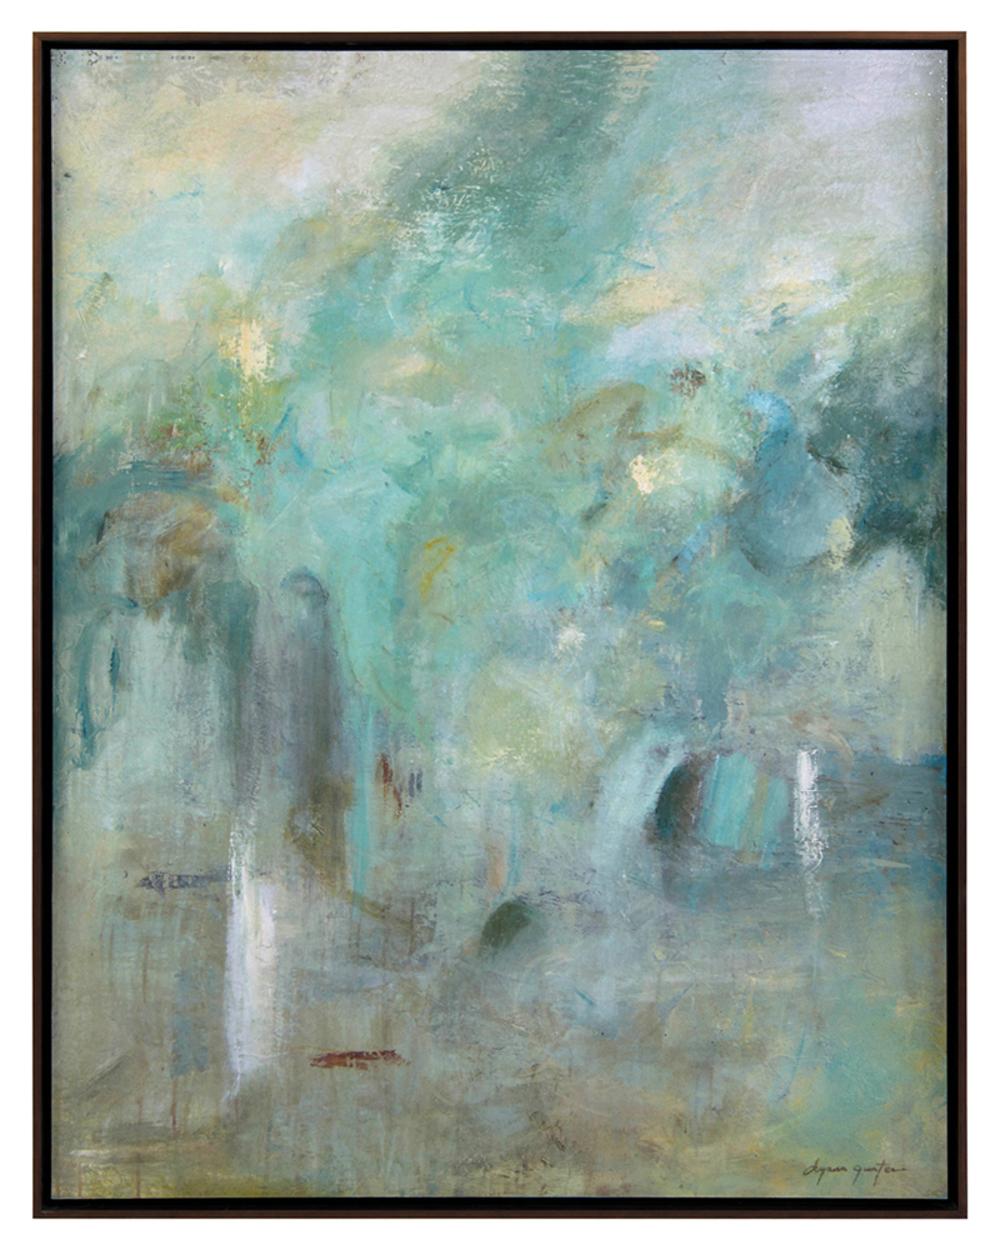 John Richard Collection - Dyann Gunter's Garden of Serenity Art